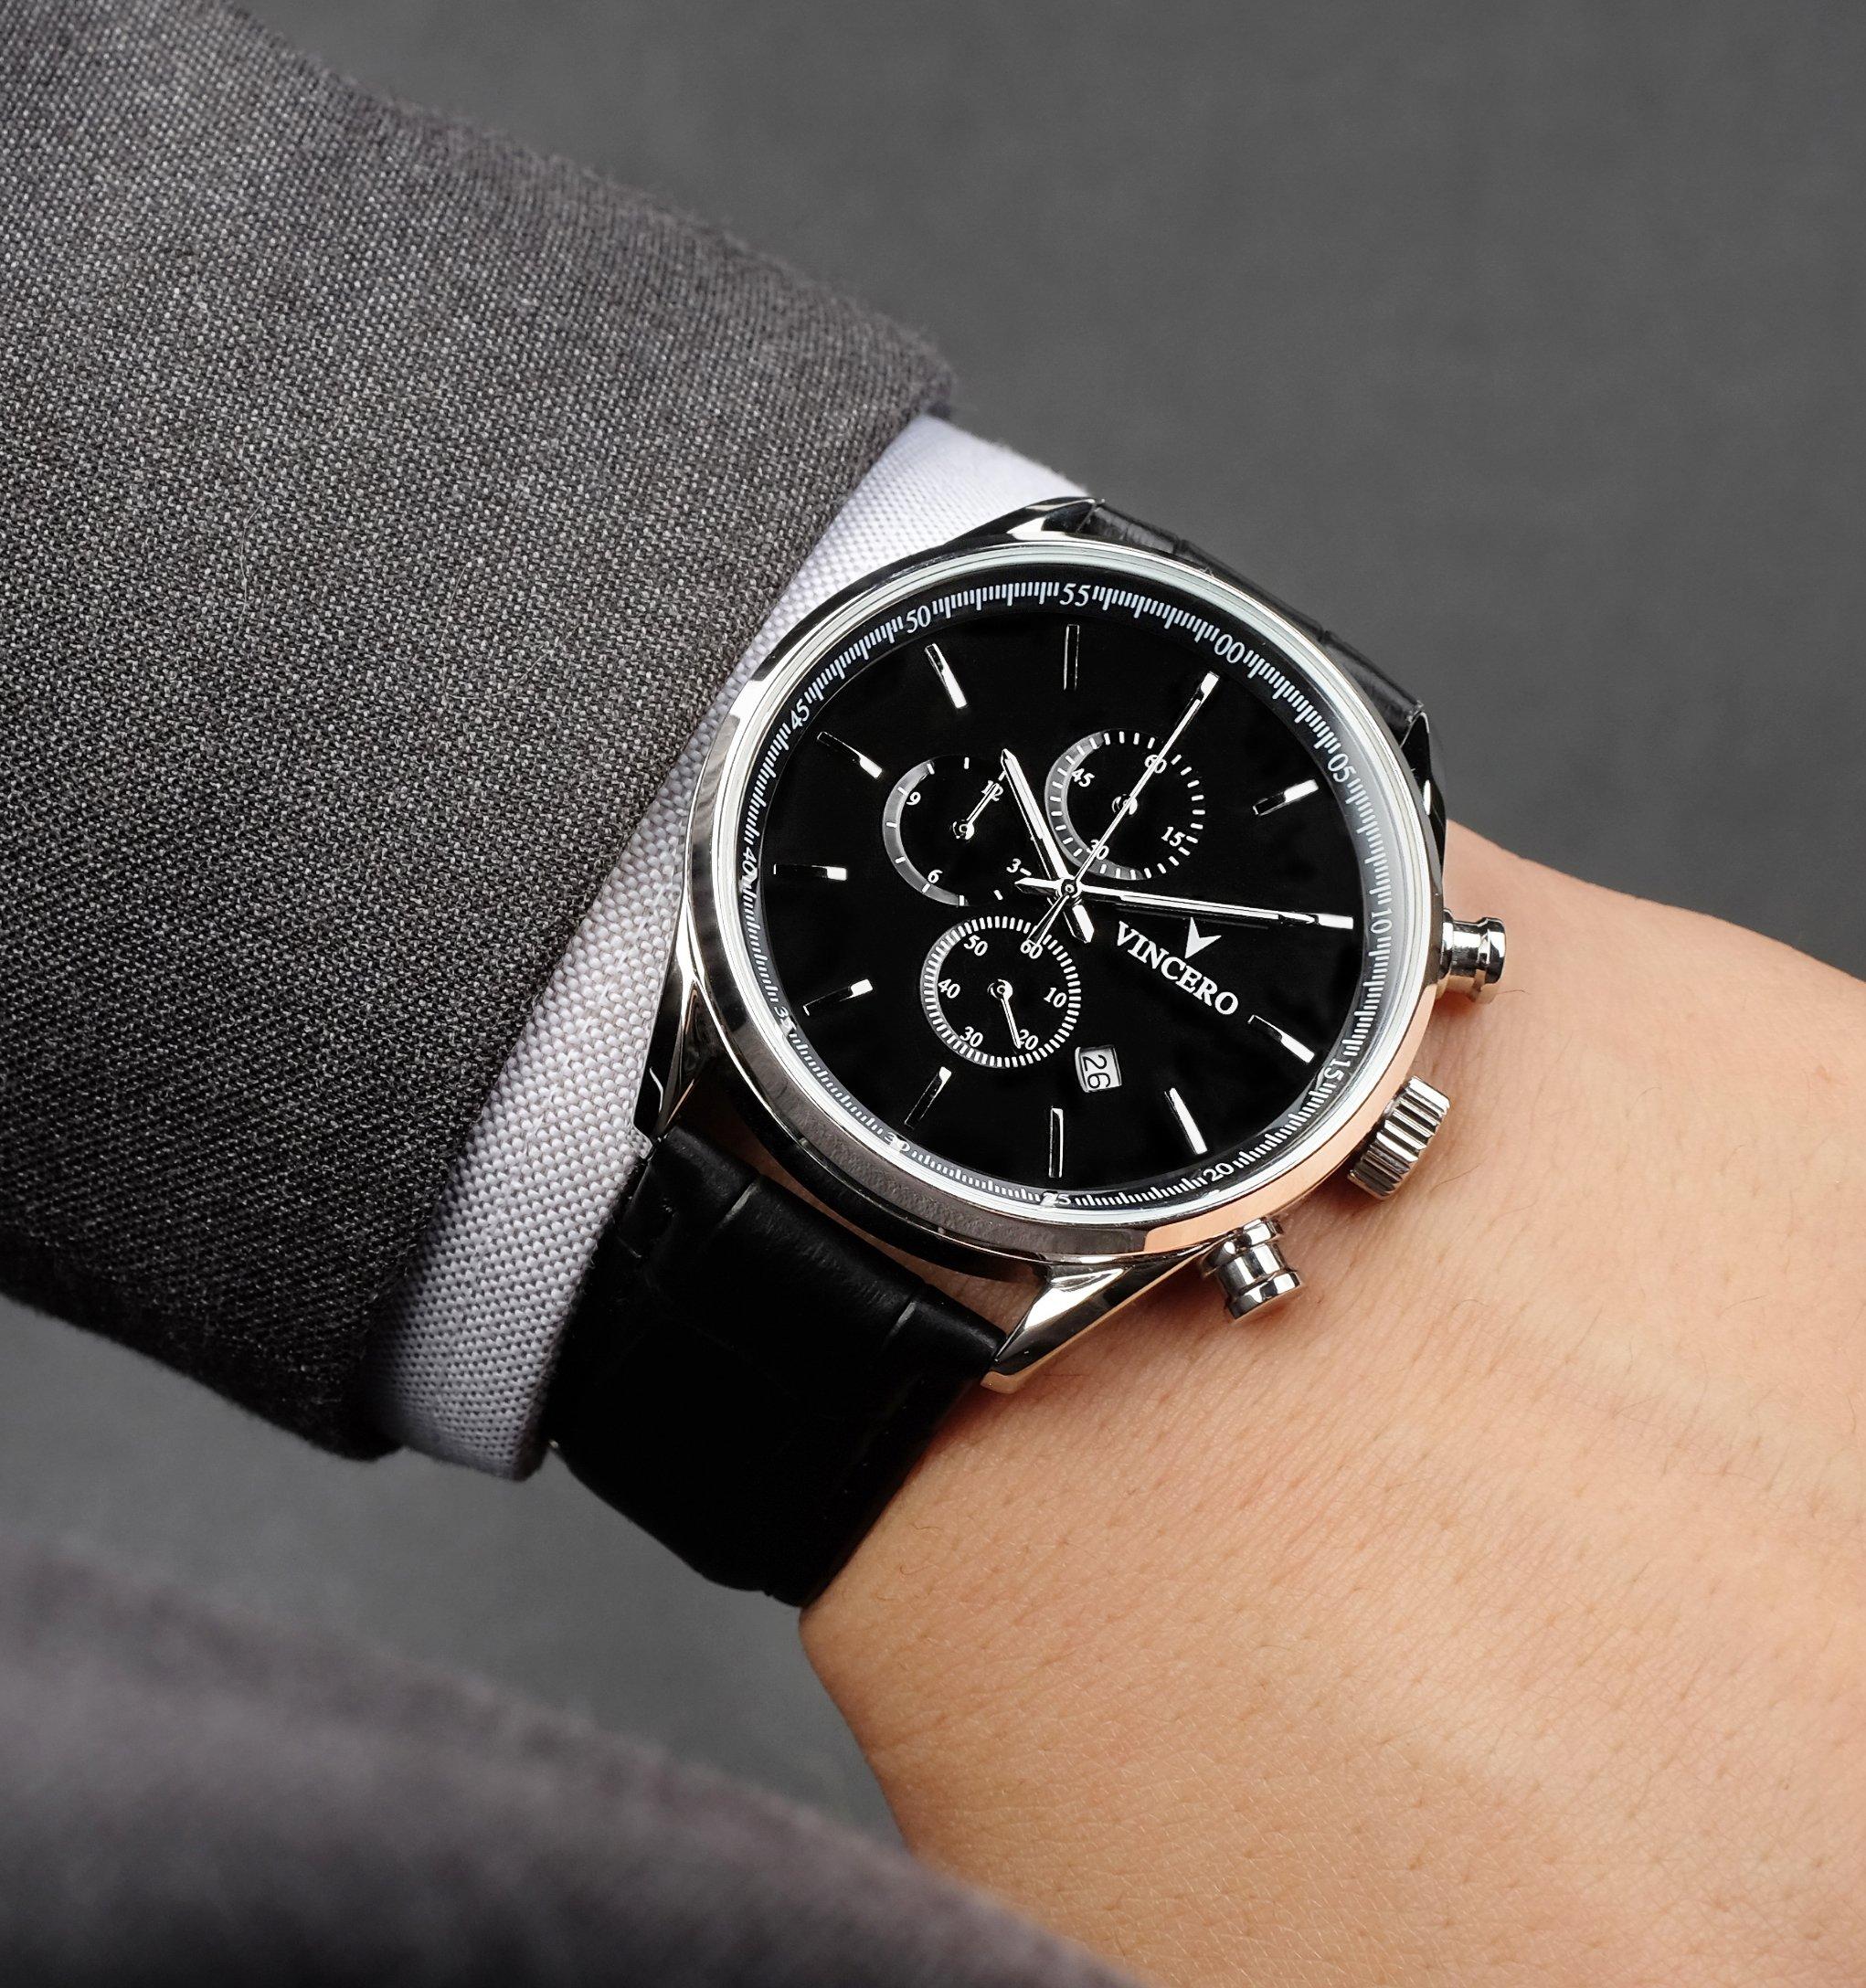 Vincero Luxury Men's Chrono S Wrist Watch — Black/Silver with Black Leather Watch Band — 43mm Chronograph Watch — Japanese Quartz Movement